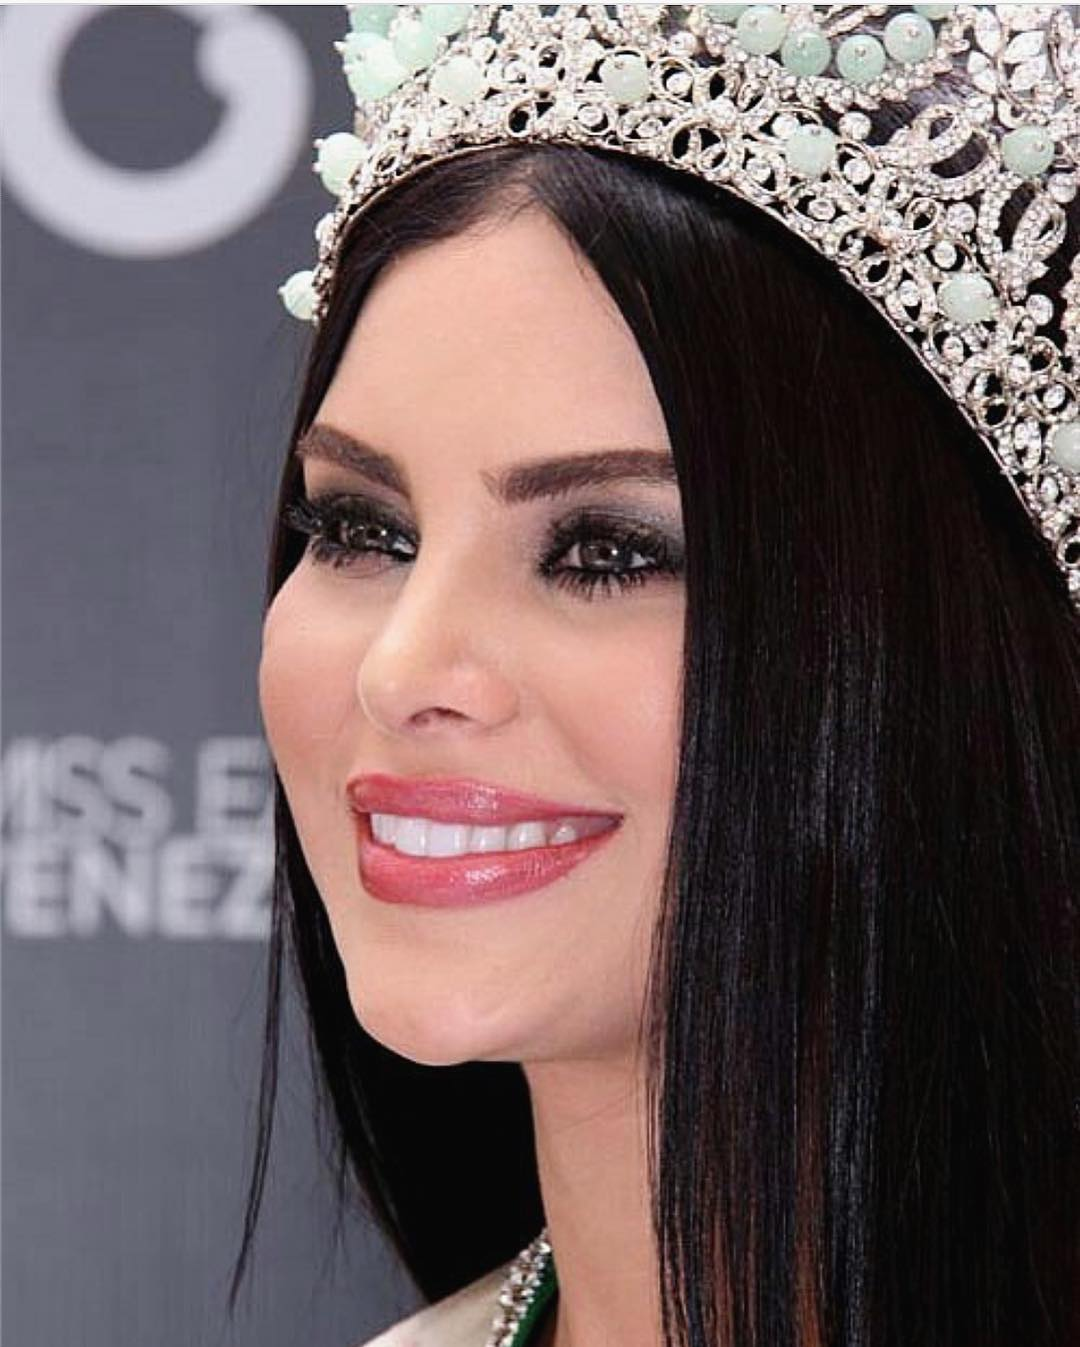 ninoska vasquez, top 8 de miss earth 2017. Yoloyo4z